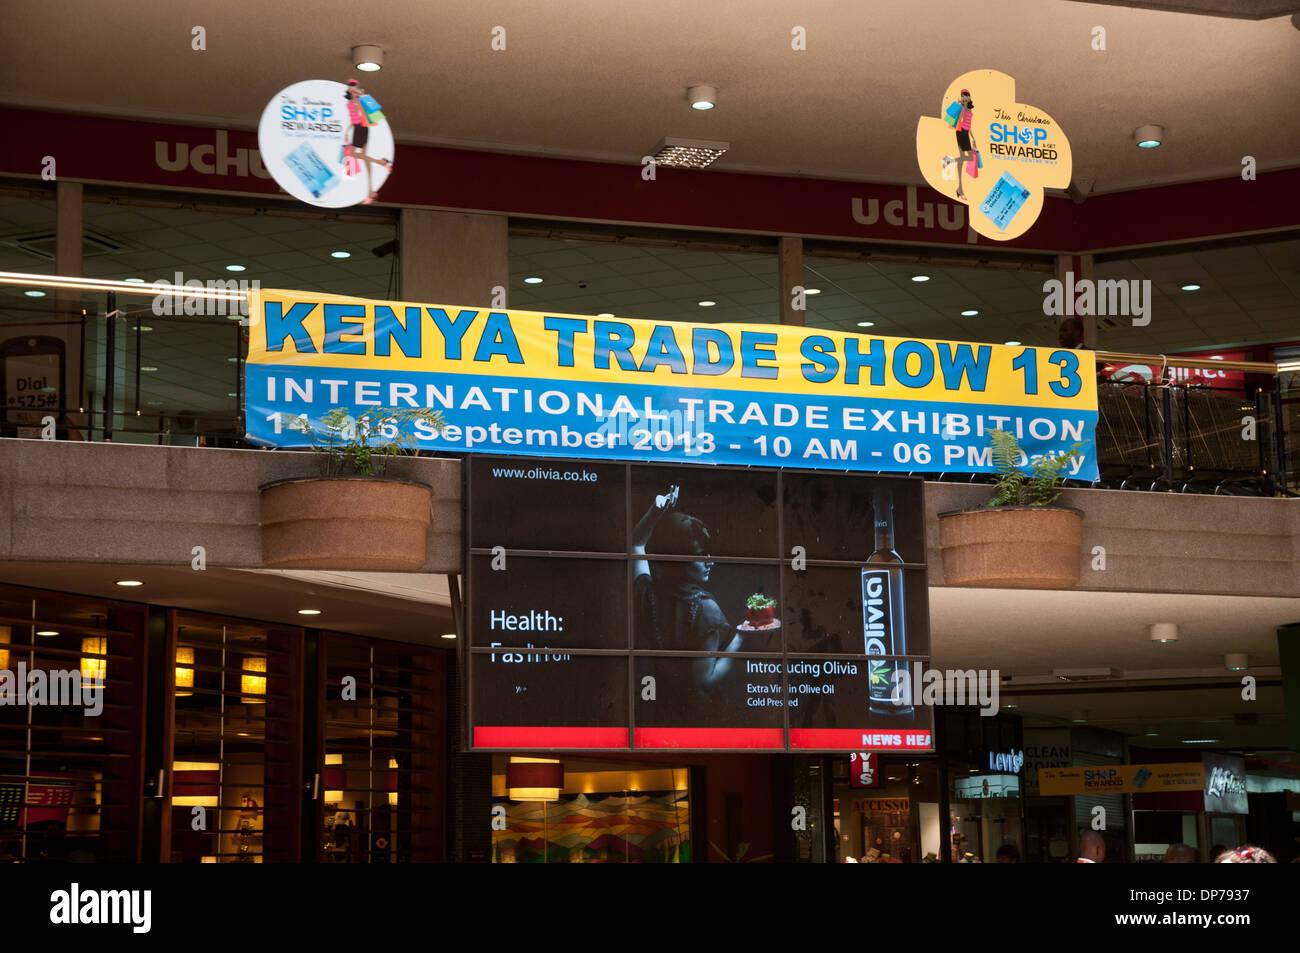 Kenya Trade Show banner en Uchumi supermercado en el Centro Comercial Centro Sarit Westlands Nairobi Kenya Imagen De Stock